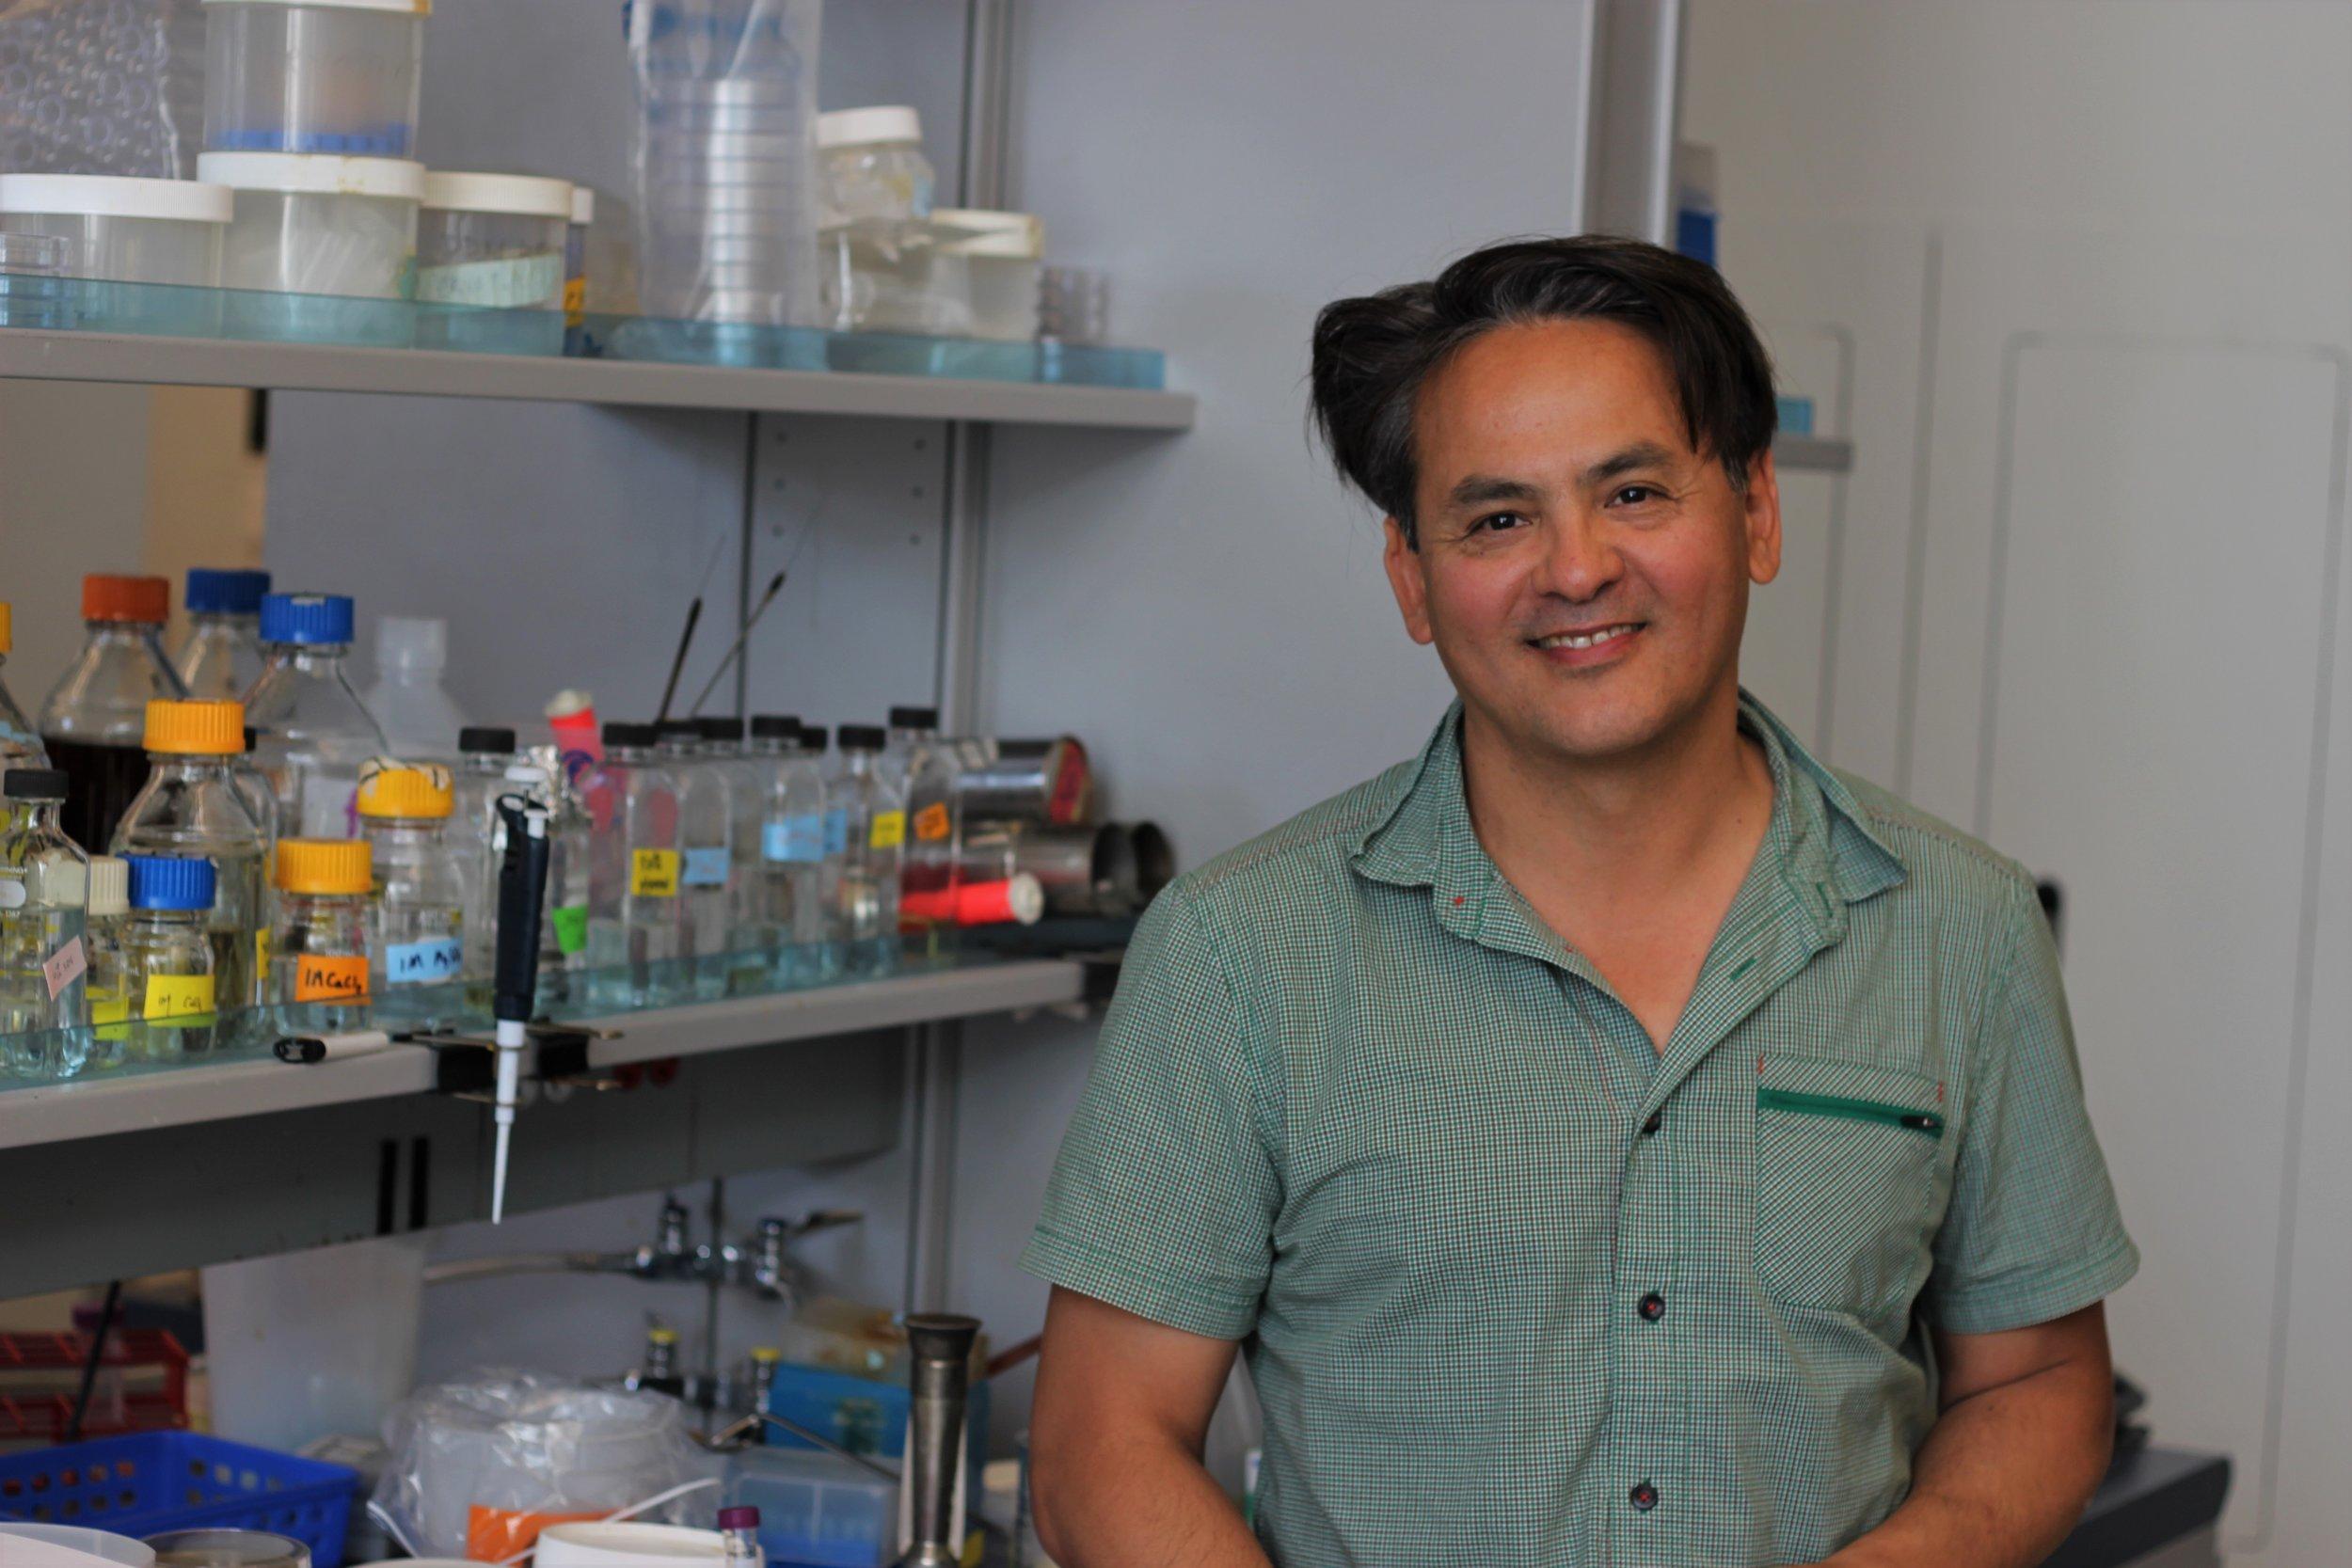 Dr. Franck Duong - PhD - University of Marseille - France / Postdoc - Dartmouth Medical School - USA / Principal Scientist - University Paris-Sud - France / Principal Investigator - UBC - Canadafduong@mail.ubc.ca